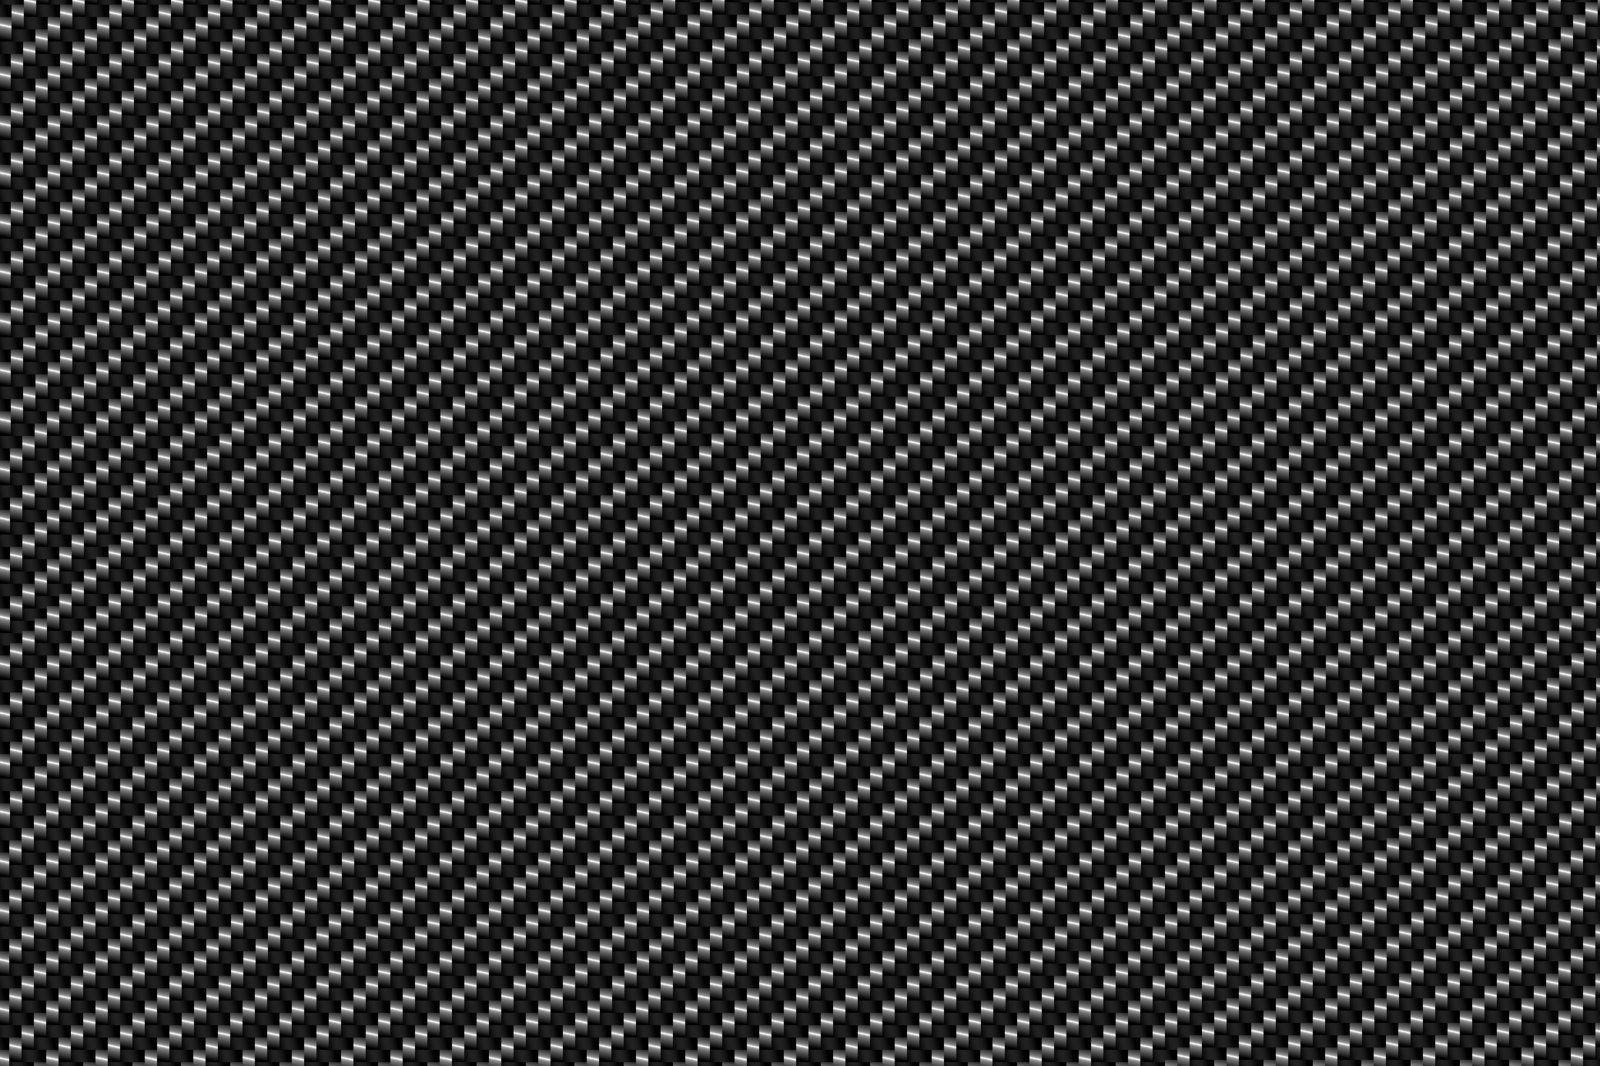 Unduh Kumpulan Wallpaper Android Hd Carbon HD Terbaik